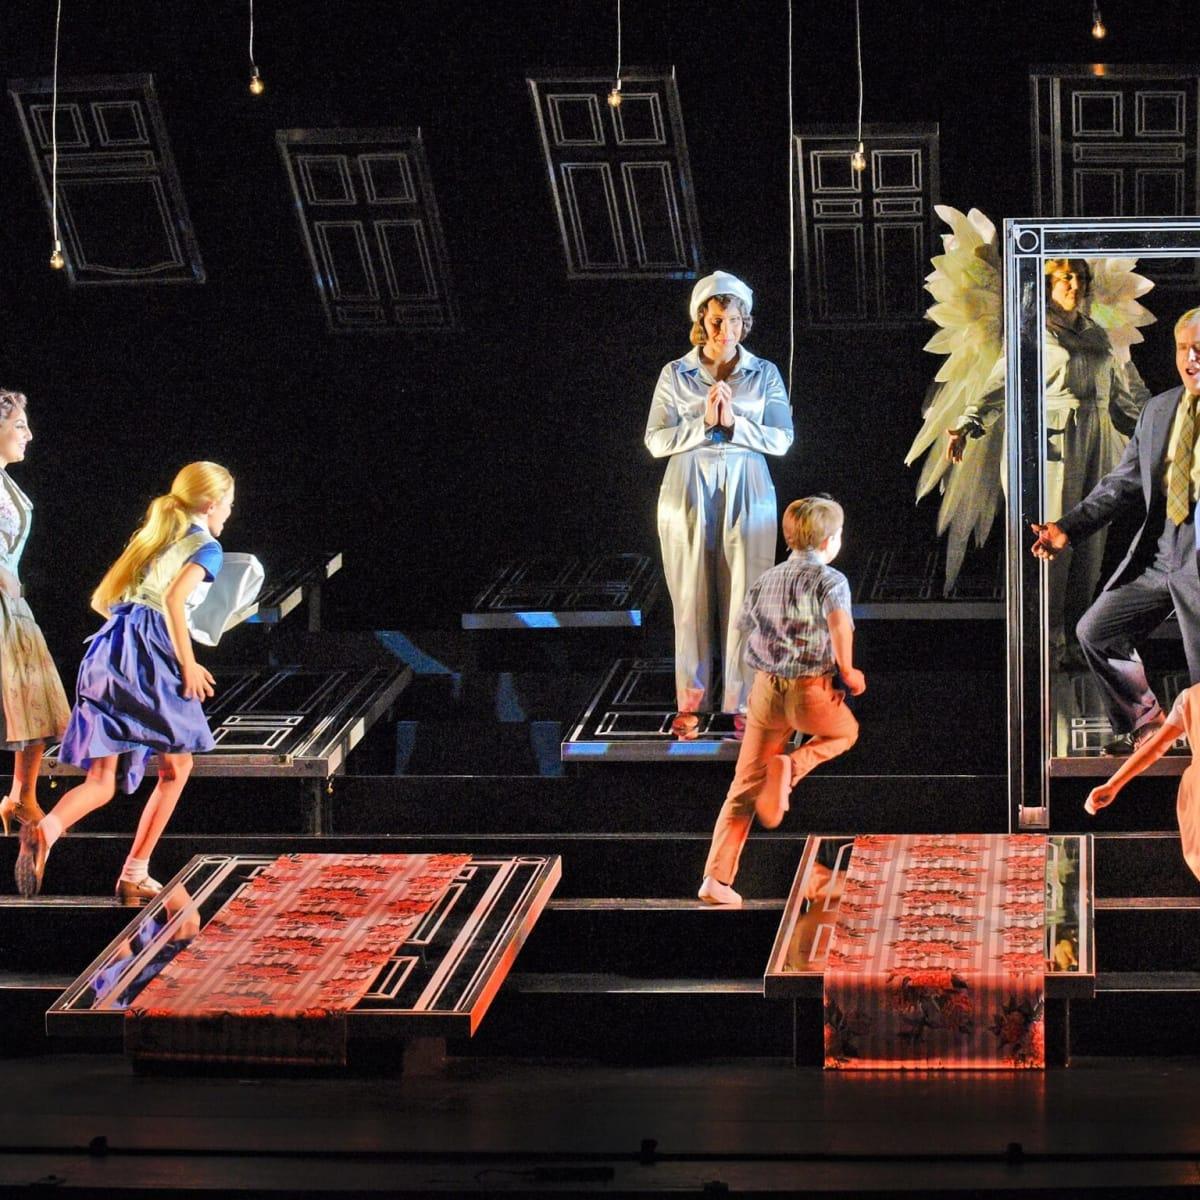 Houston Grand Opera It's A Wonderful Life, Andrea Carroll, C.J. Friend, Talise Trevigne, Levi Smith